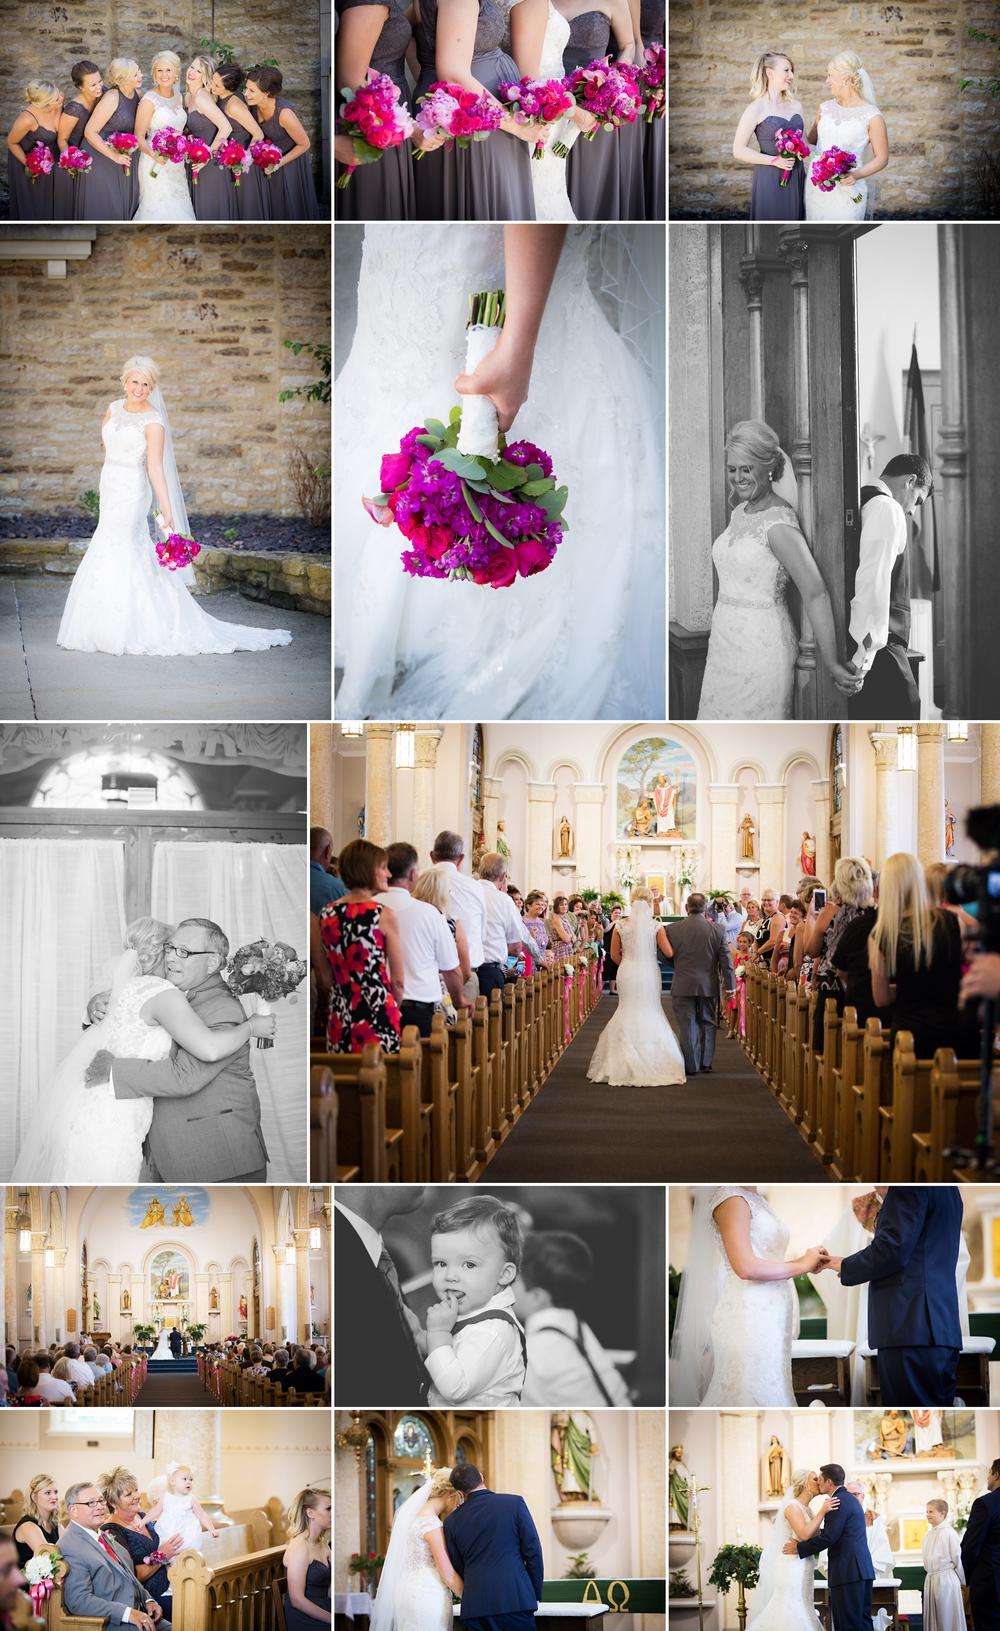 Kuhn wedding 4.jpg